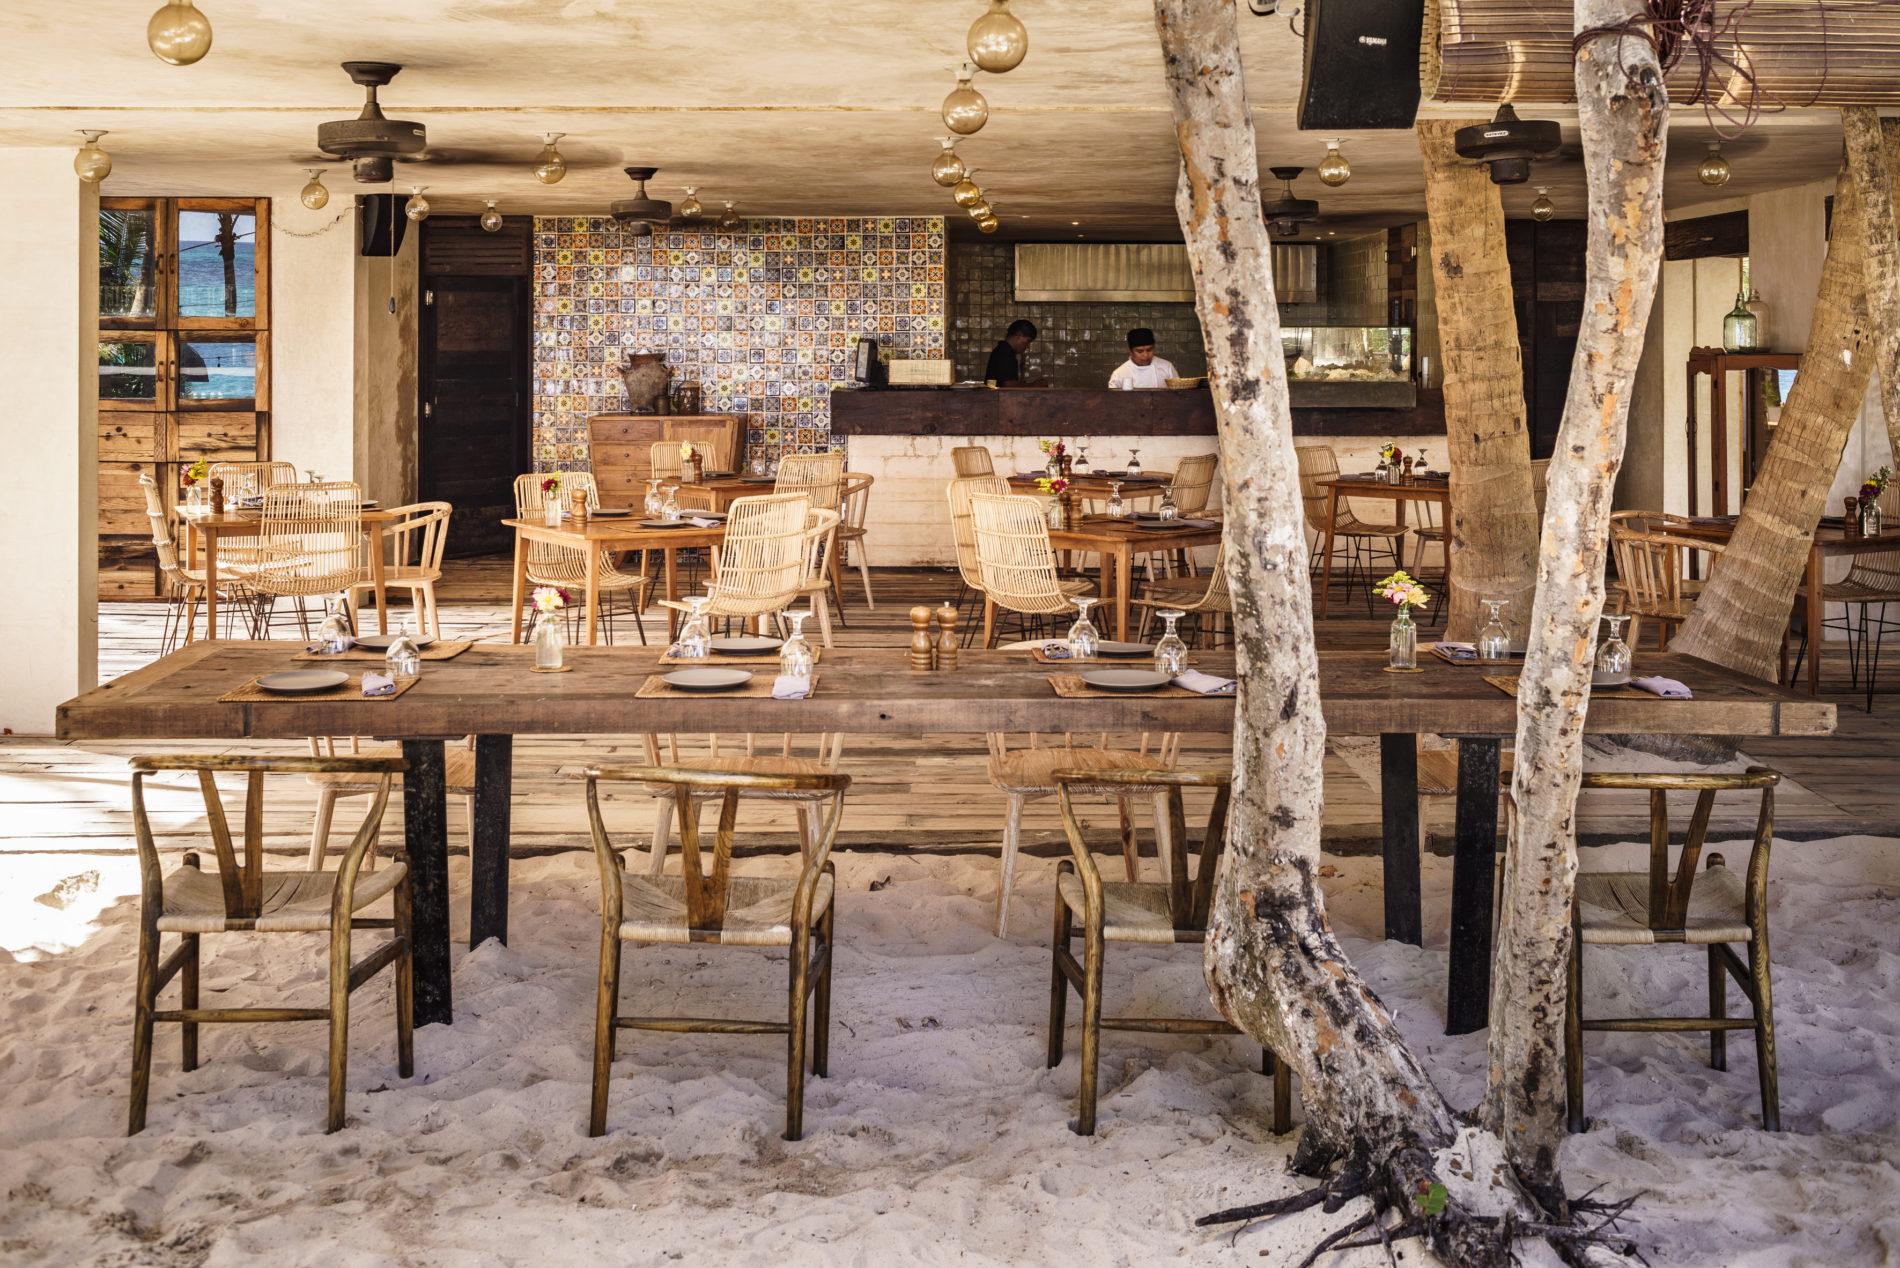 Cuisine Betulum Lifestyle Luxury Hotel Private Villas Spa